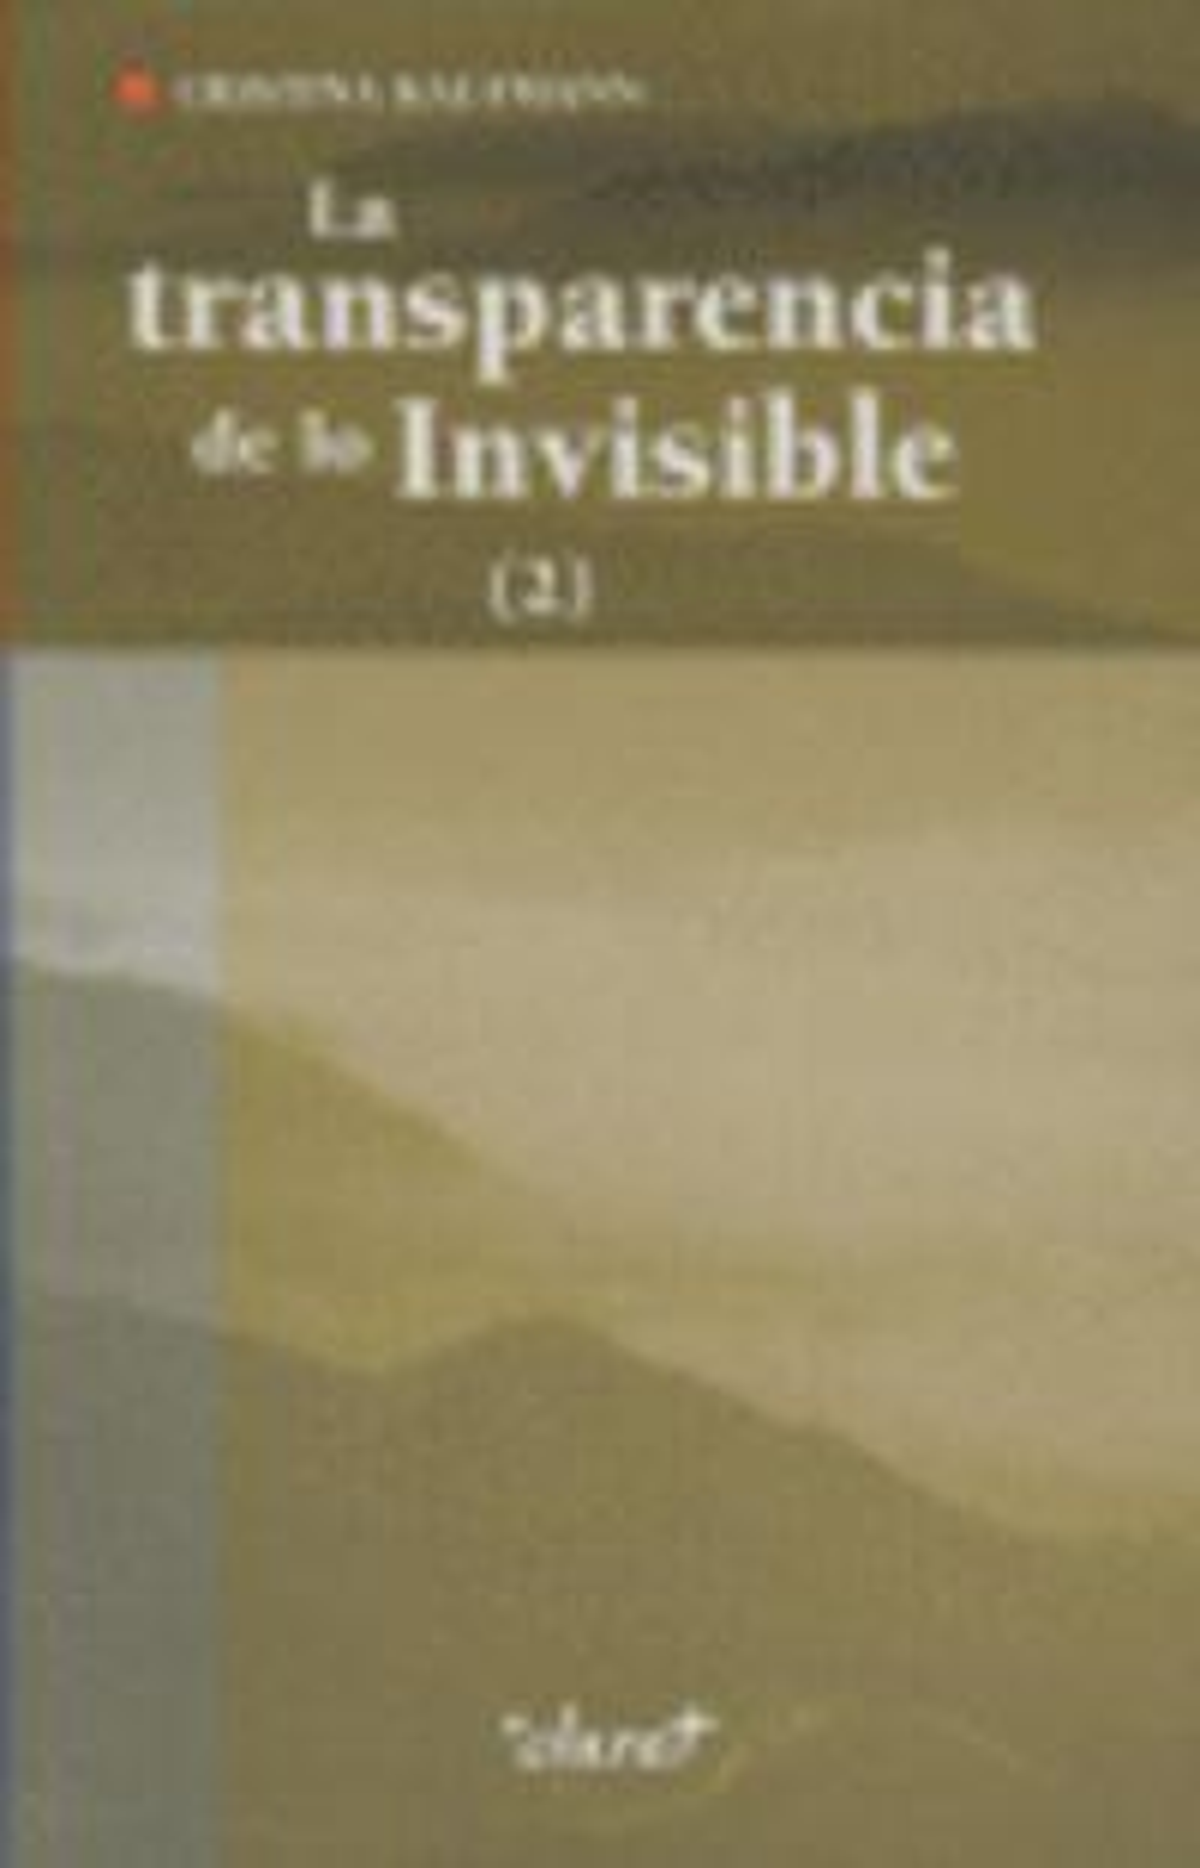 La transparencia de los invisible - Kaufmann, Cristina